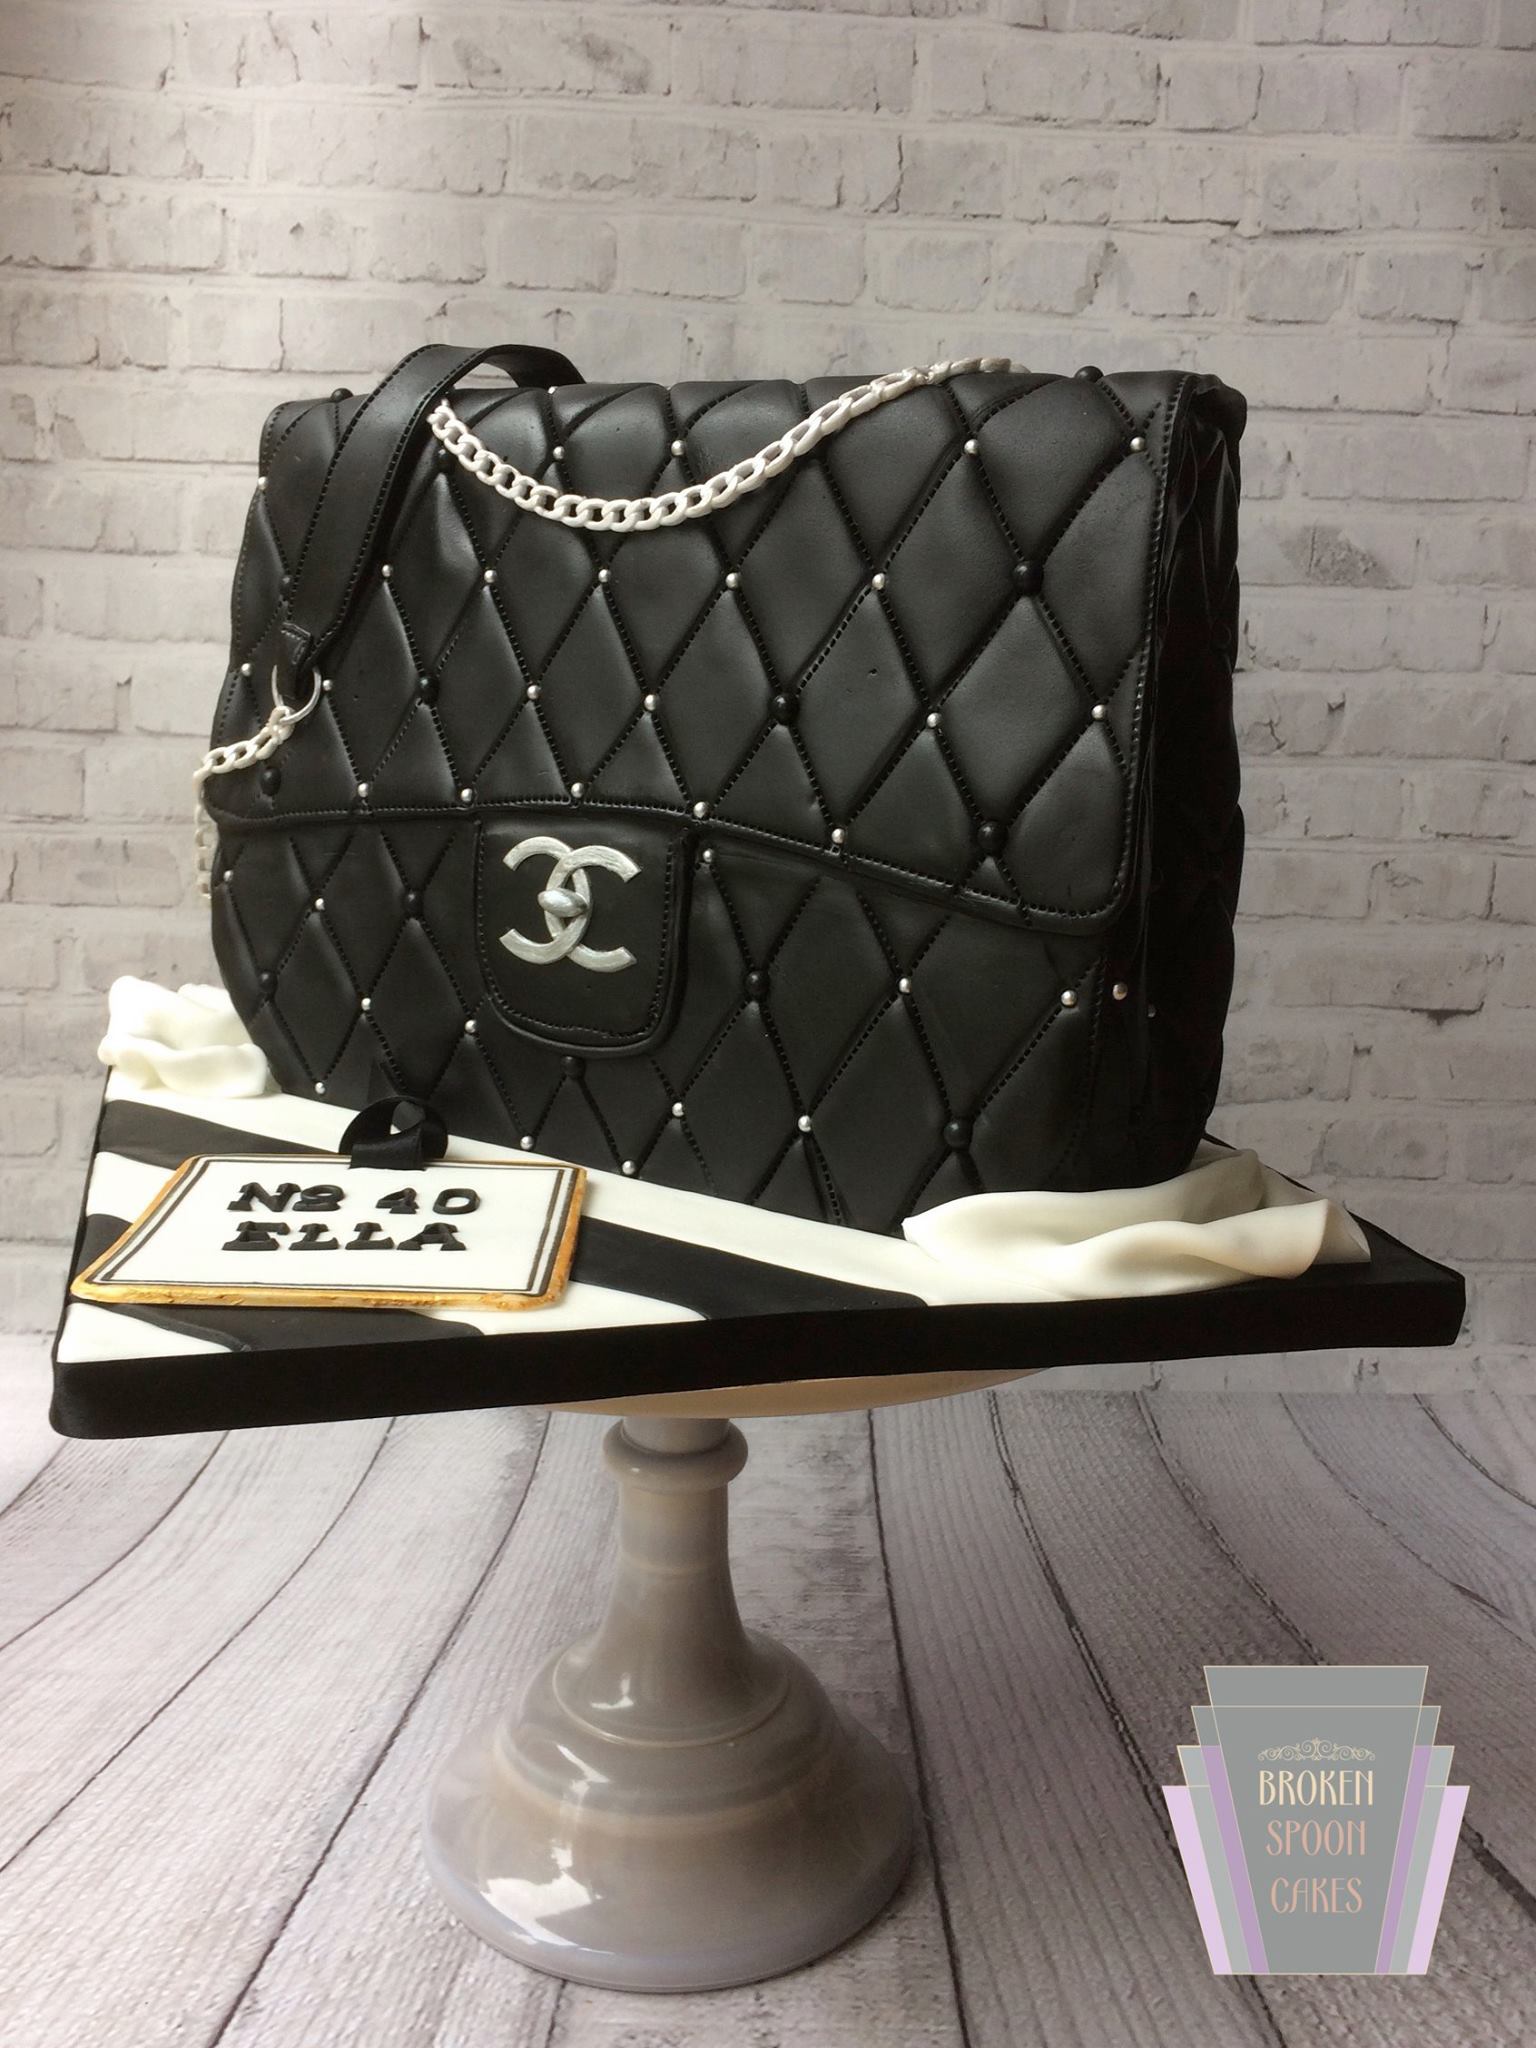 Chanel Handbag Cake